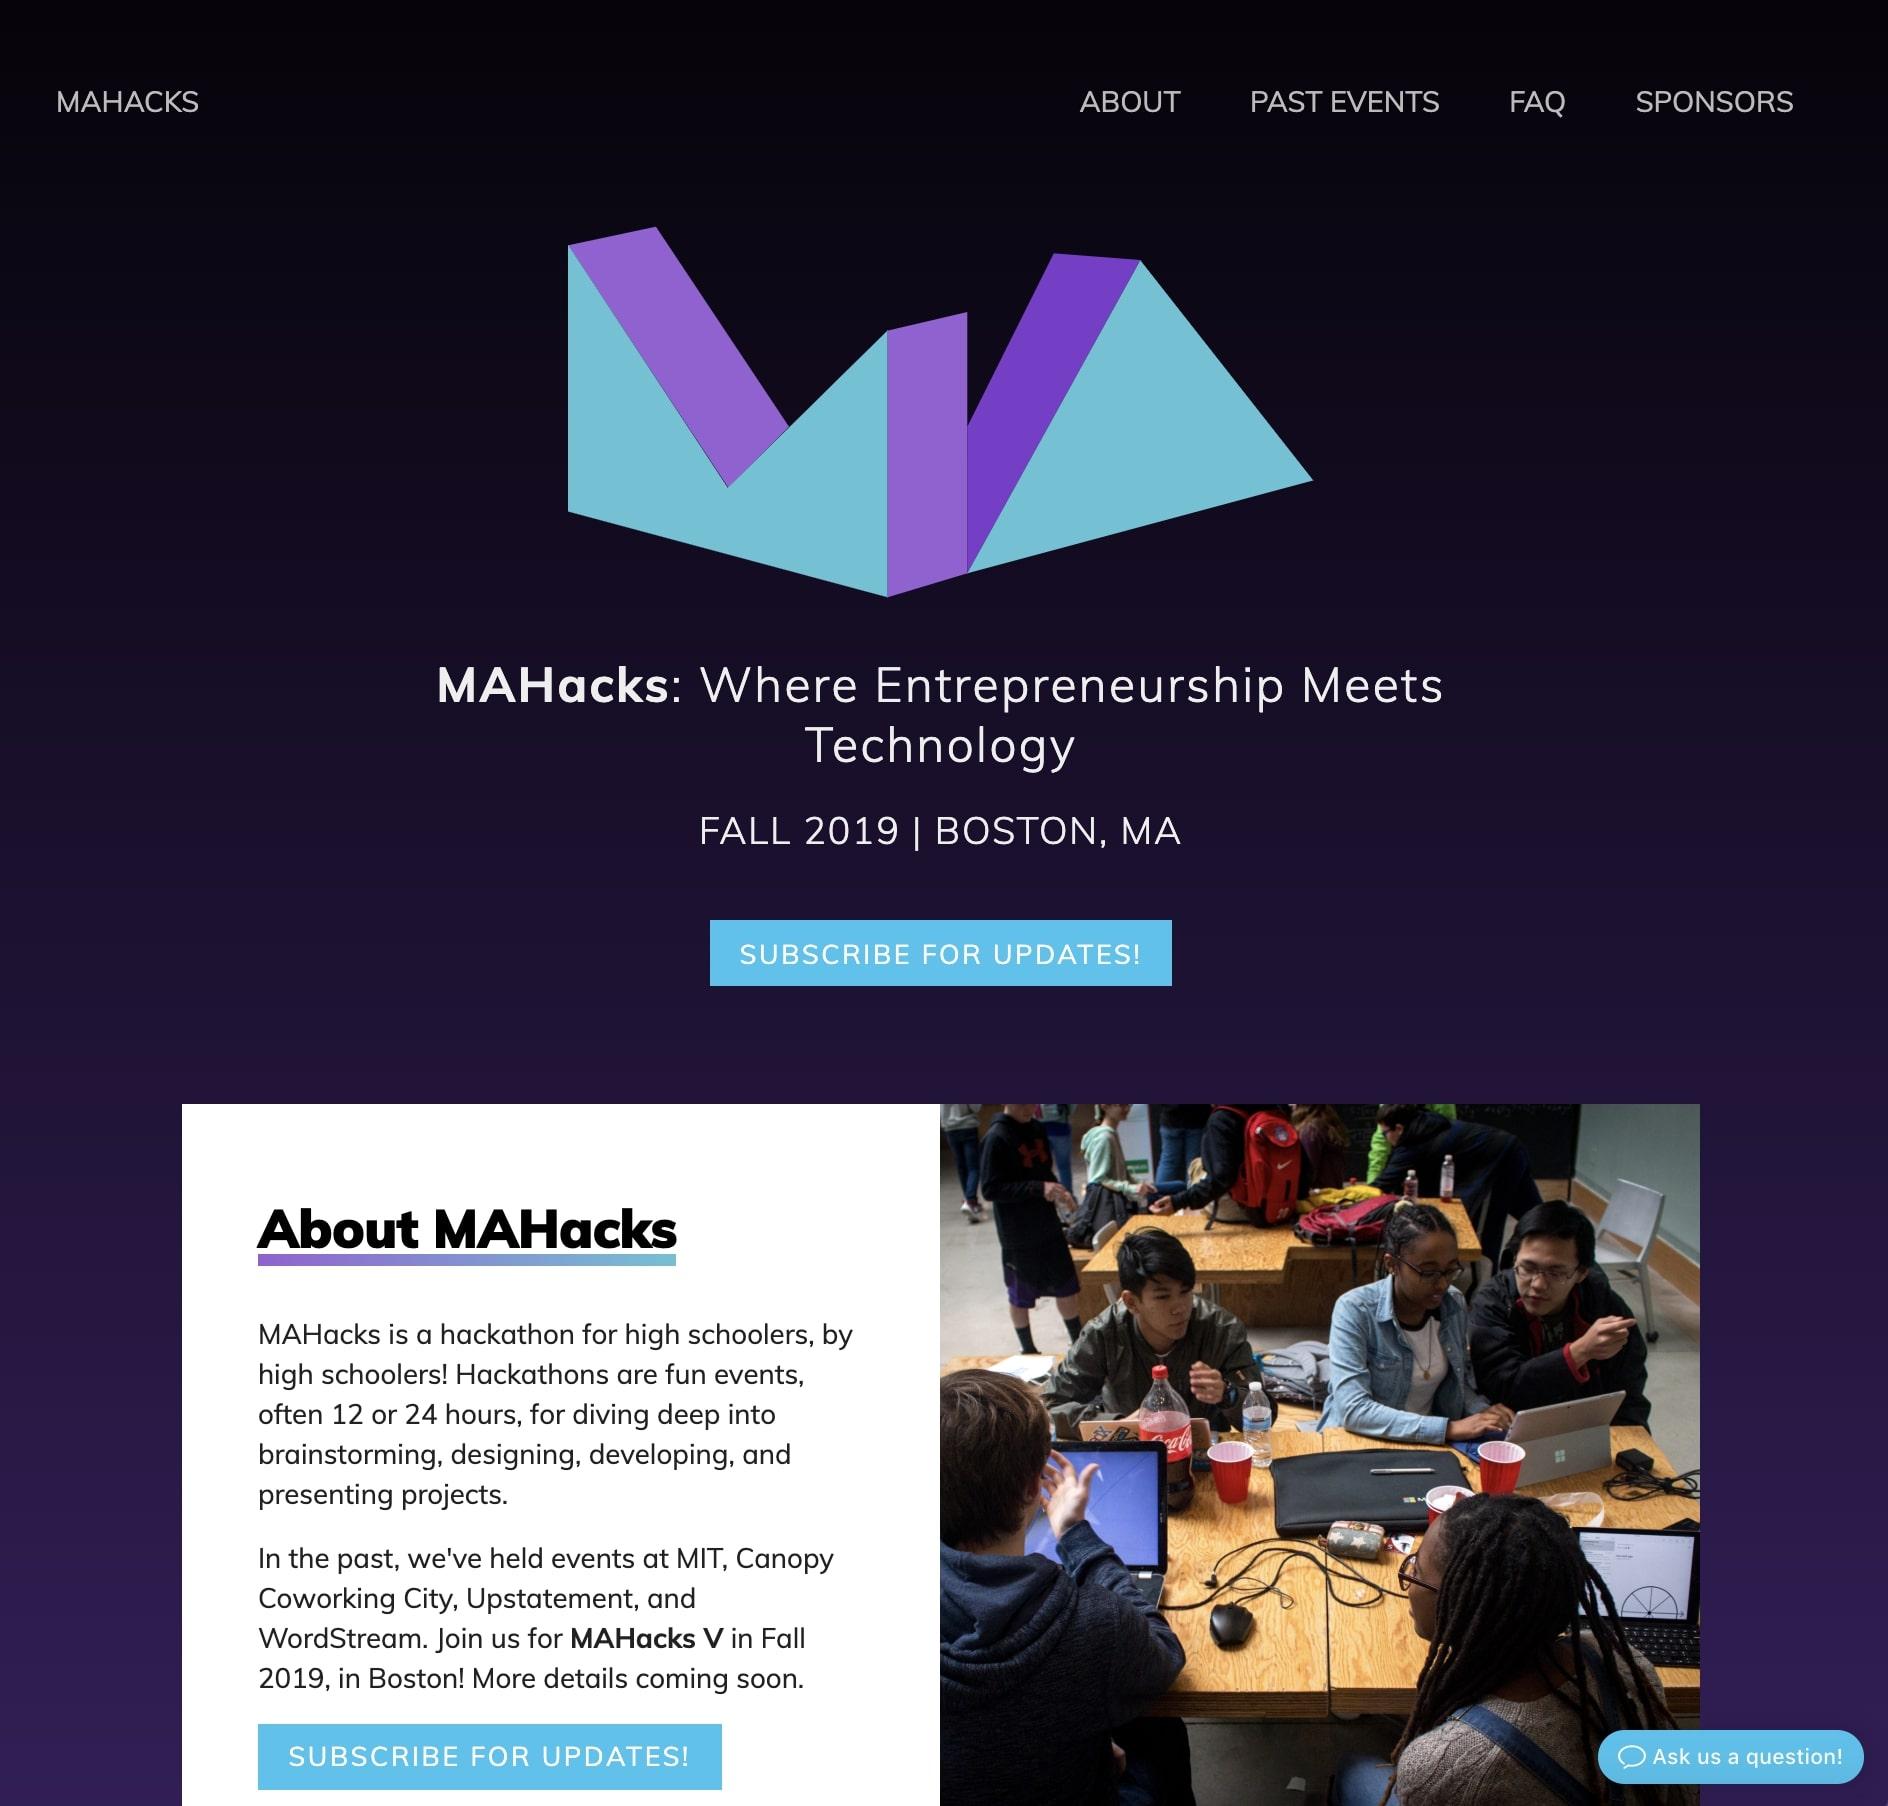 MAHacks mahacks.com